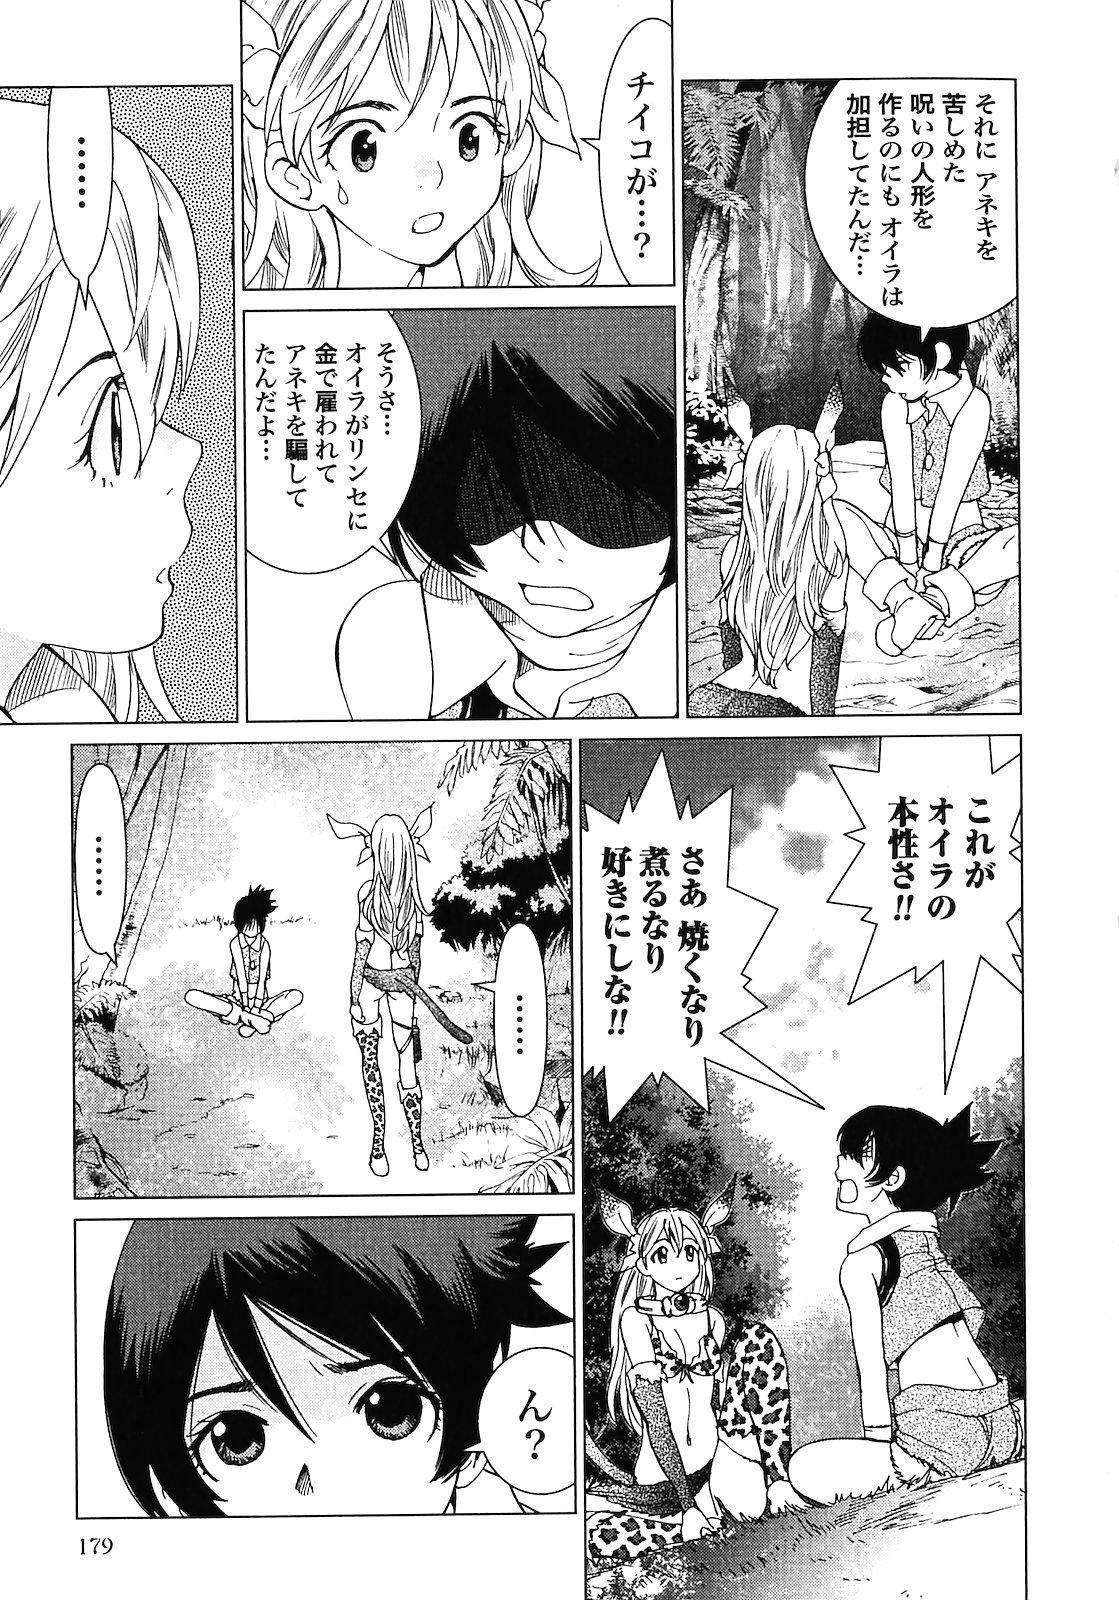 Makyo no Shanana Vol.02 180